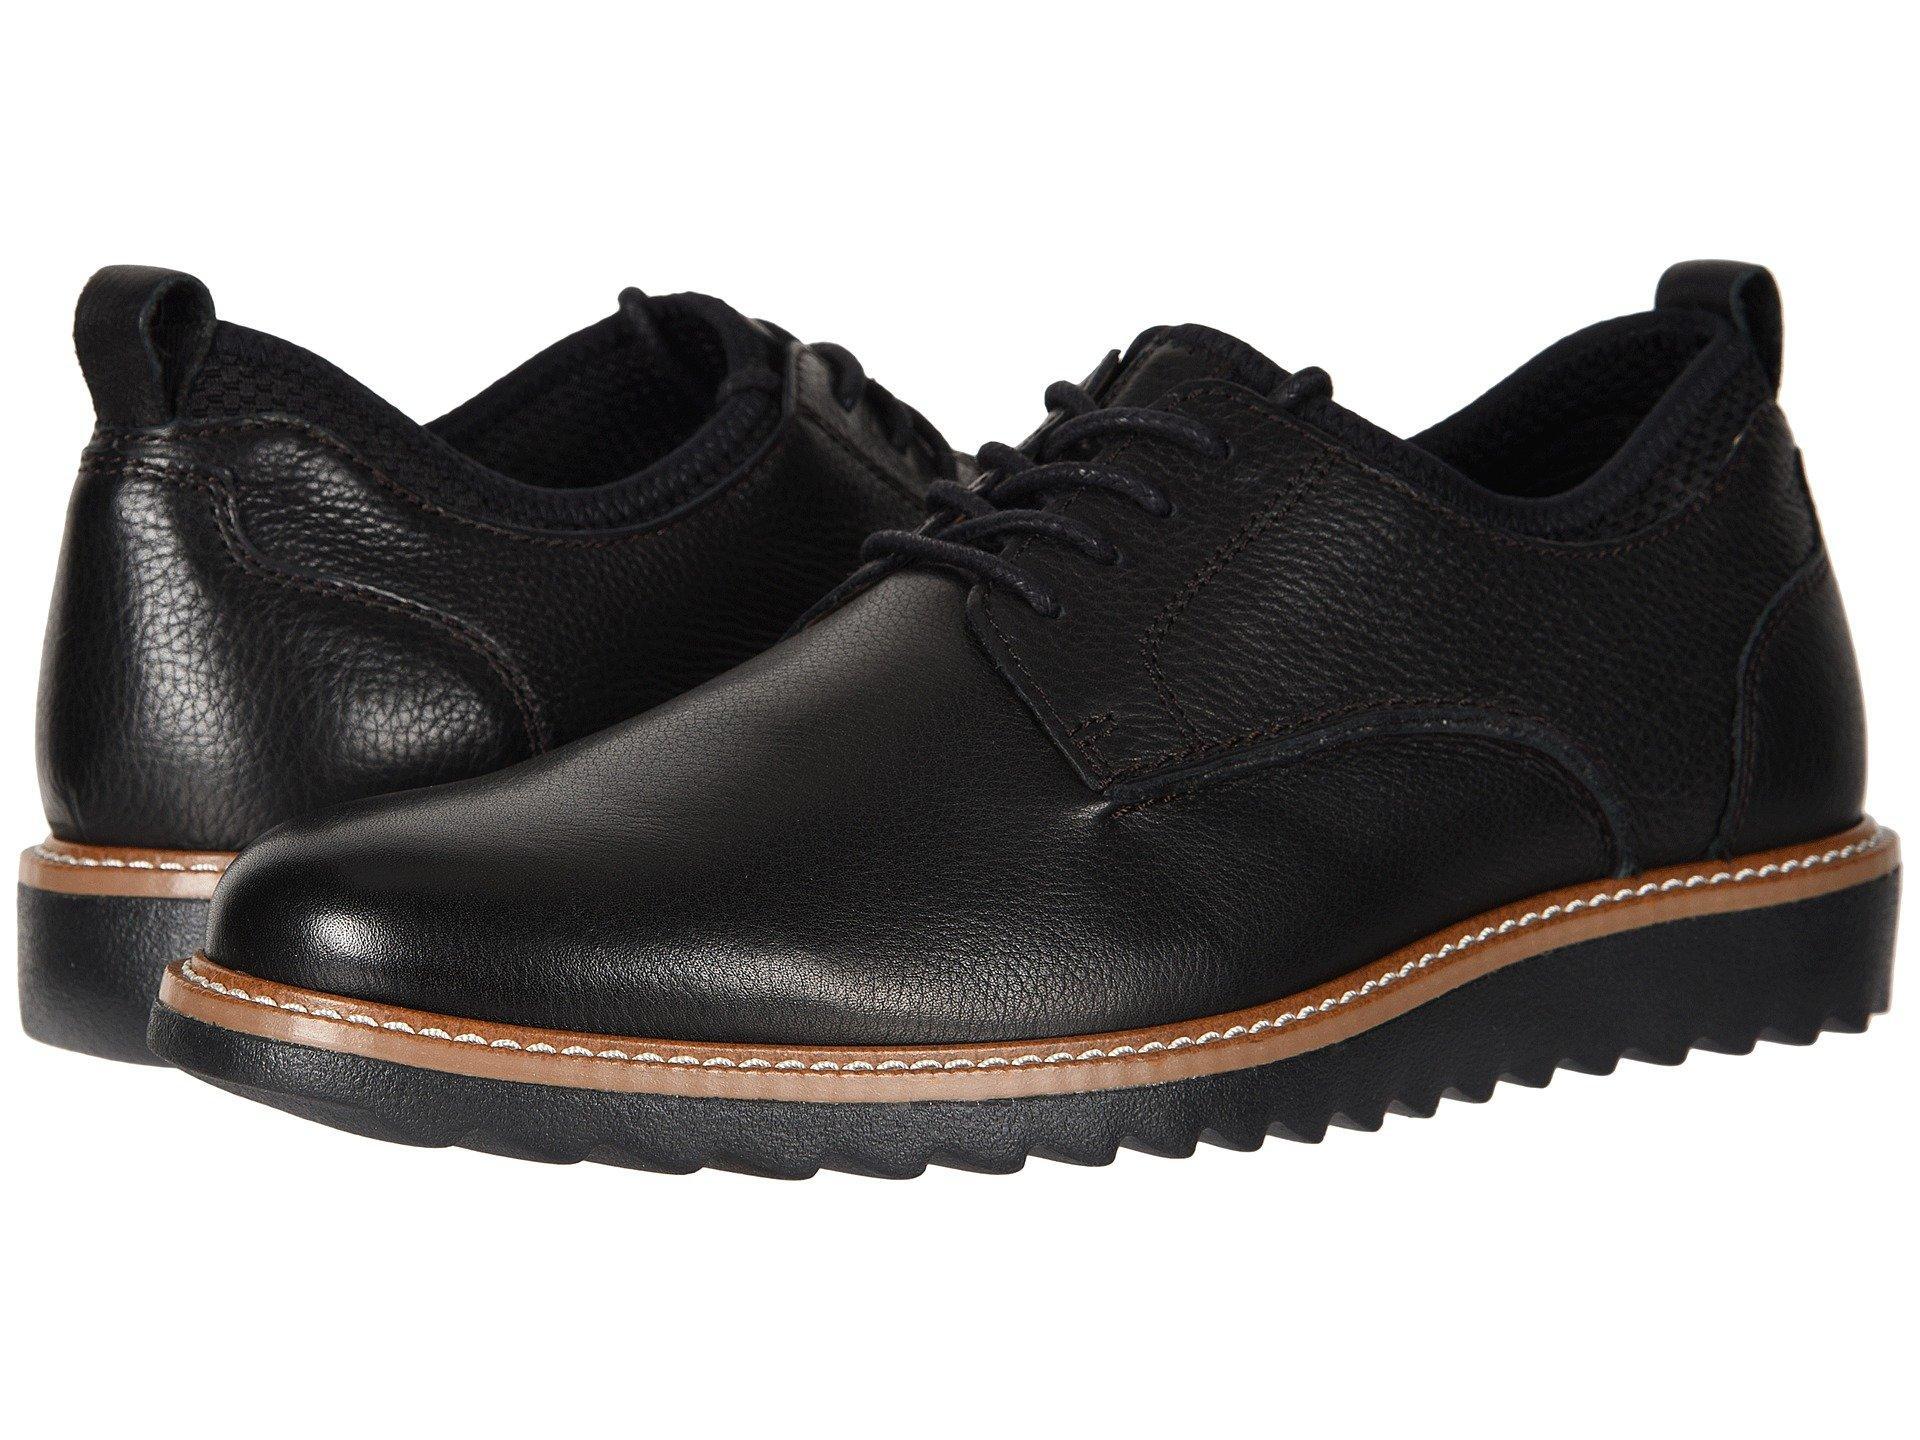 9d8328c288ce Lyst - Dockers Elon Leather Smart Series Dress Casual Oxford (black ...